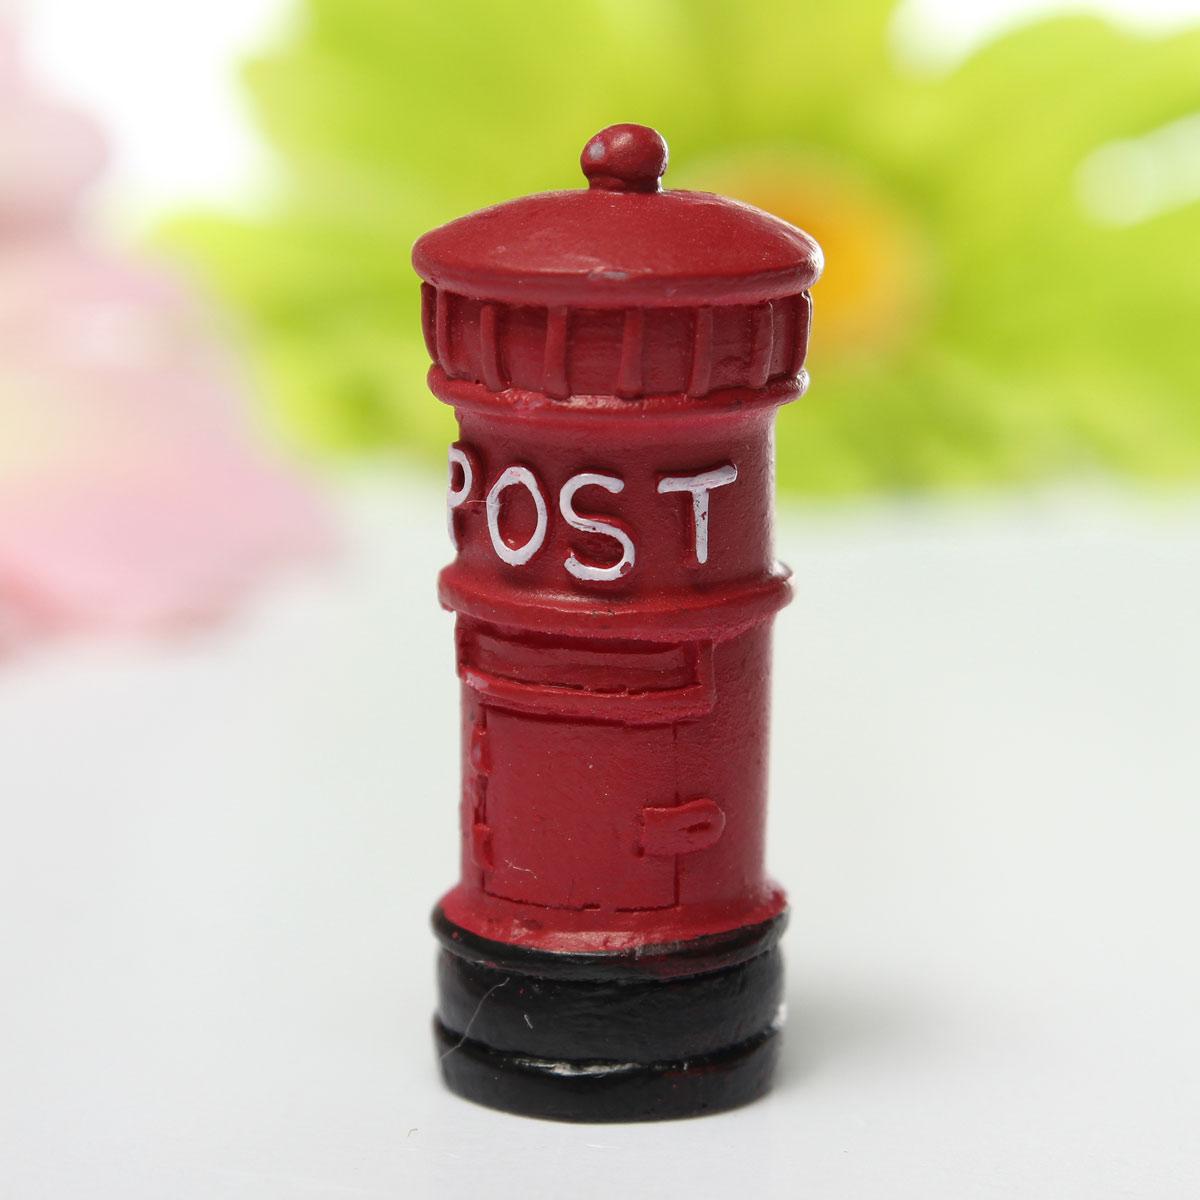 Garden Ornament Miniature Figurine Resin Craft Plant Pots Fairy Dollhouse Decor